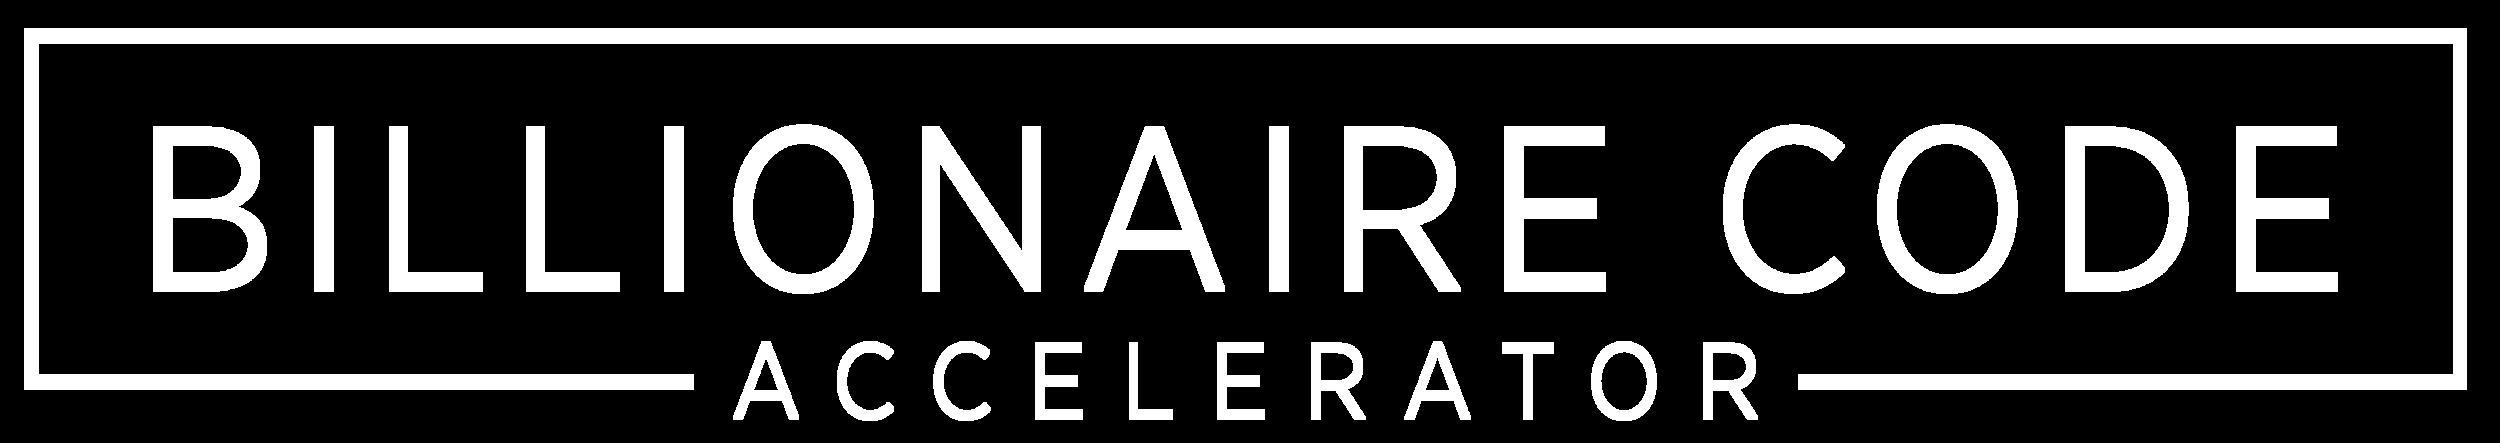 BillionaireCode_Accelerator__Logo_Large_White.png